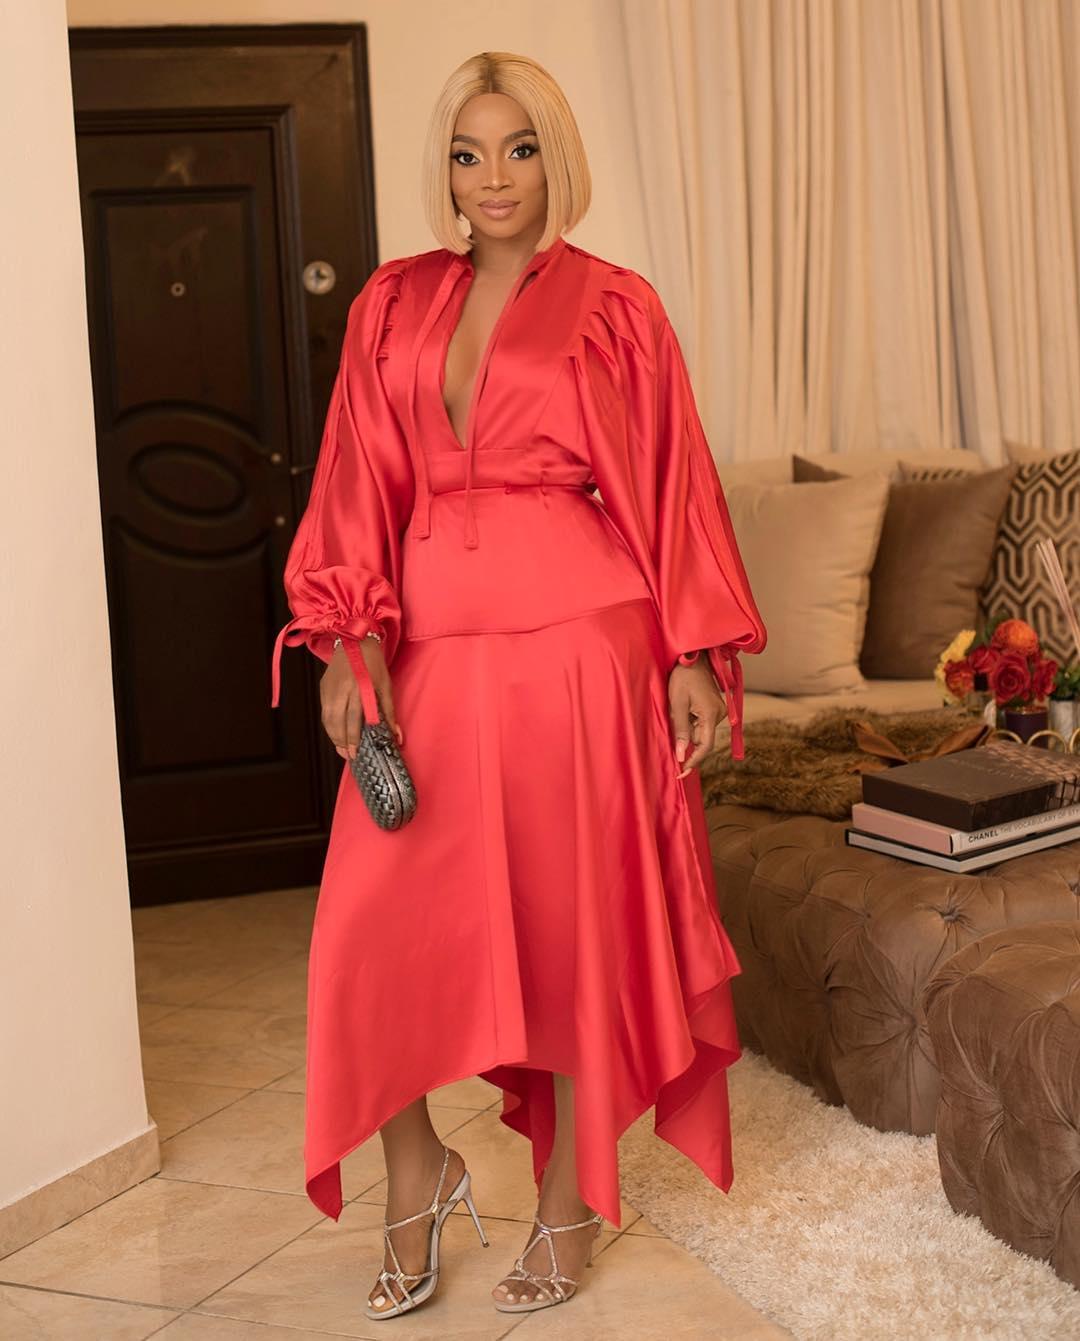 Toke Makinwa Brilliantly Styled a £355 Self-Portrait Dress